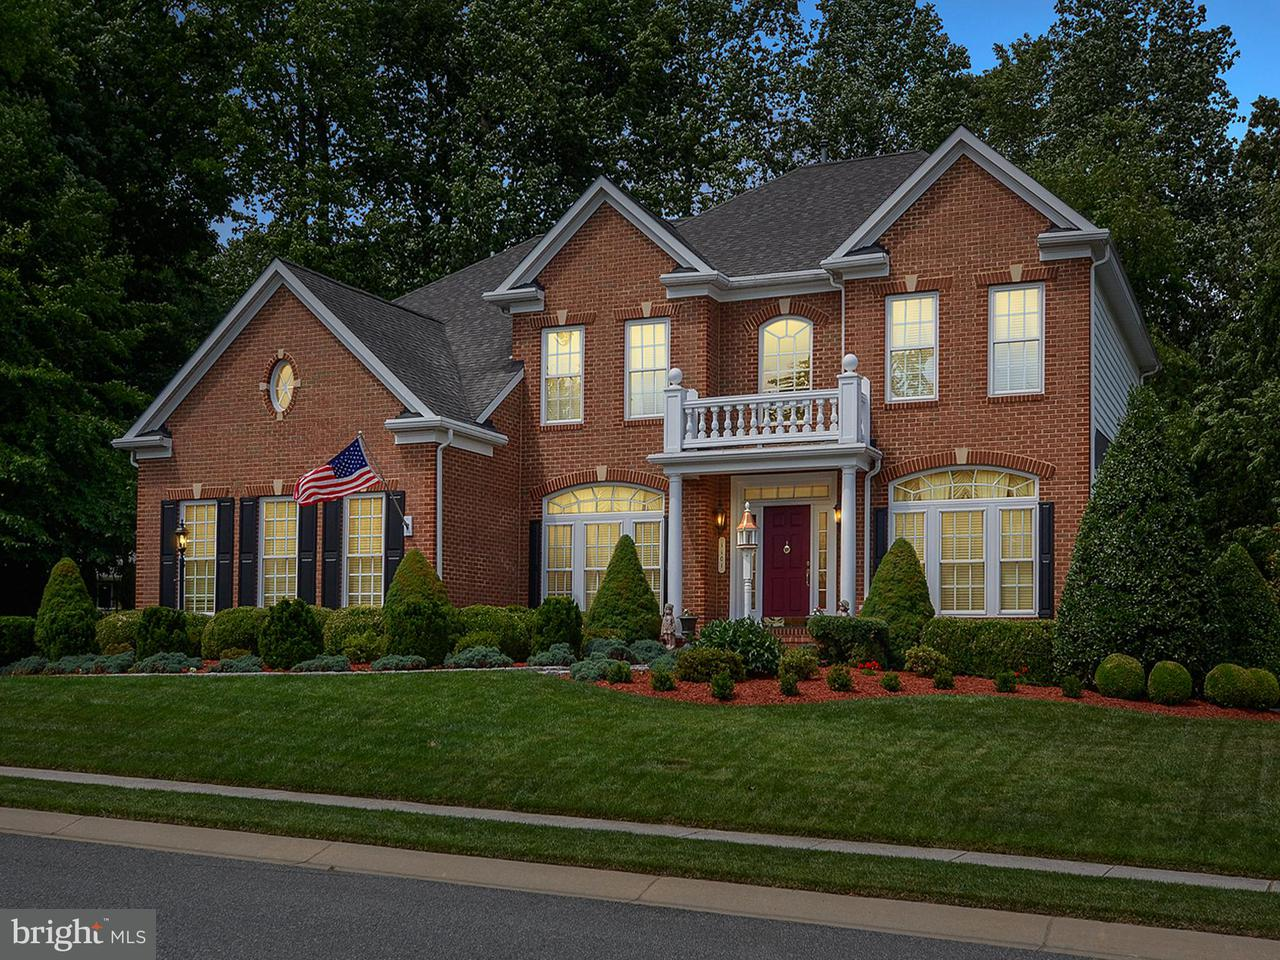 Single Family Home for Sale at 1101 Oak Tree Drive 1101 Oak Tree Drive Havre De Grace, Maryland 21078 United States